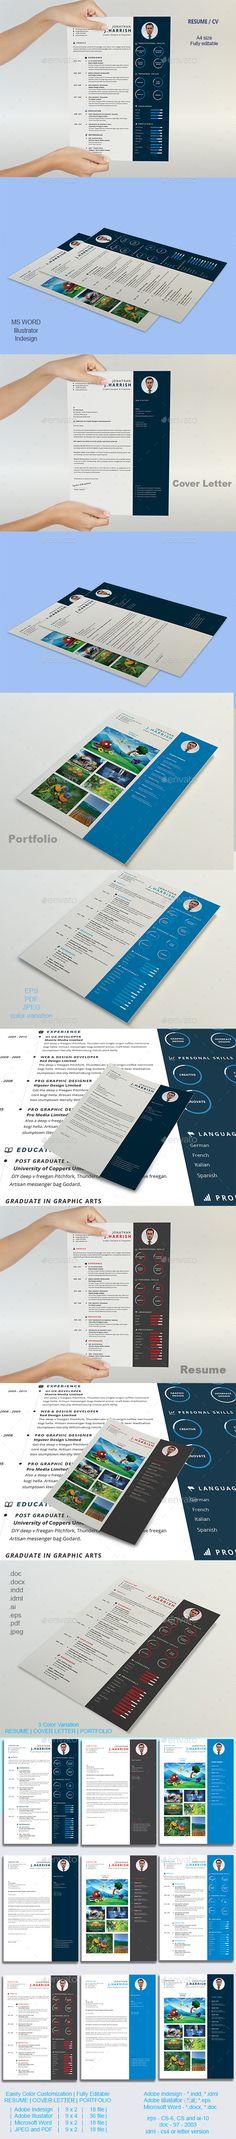 Infographic Resume\/Cv Volume 7 Infographic resume, Resume cv and - infographic resume templates